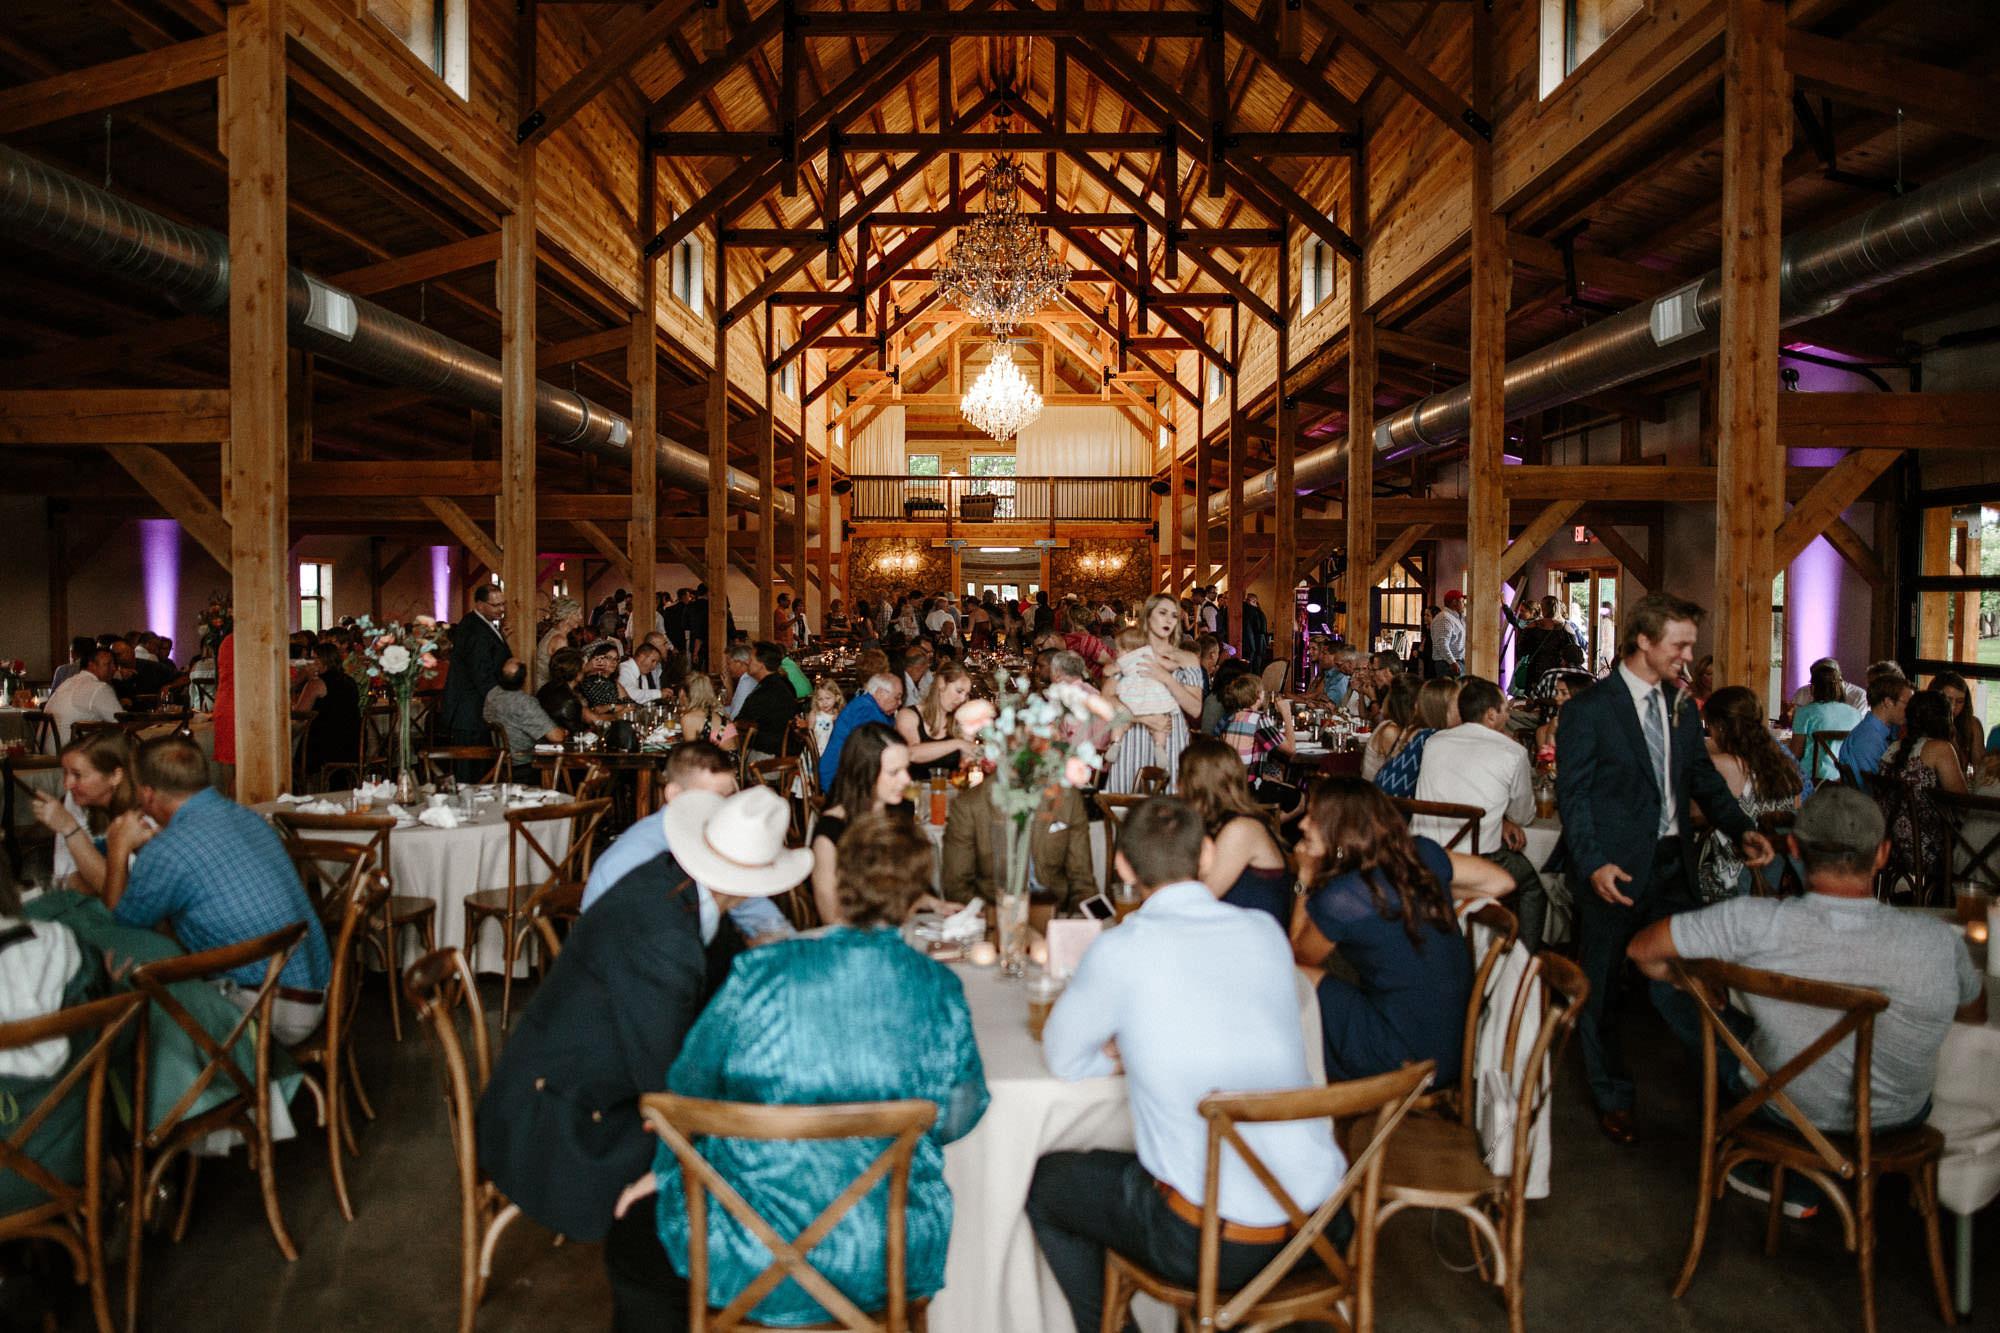 meadow-barn-wedding-sioux-falls-south-dakota-romantic-adventerous-michael-liedtke-photography066.jpg